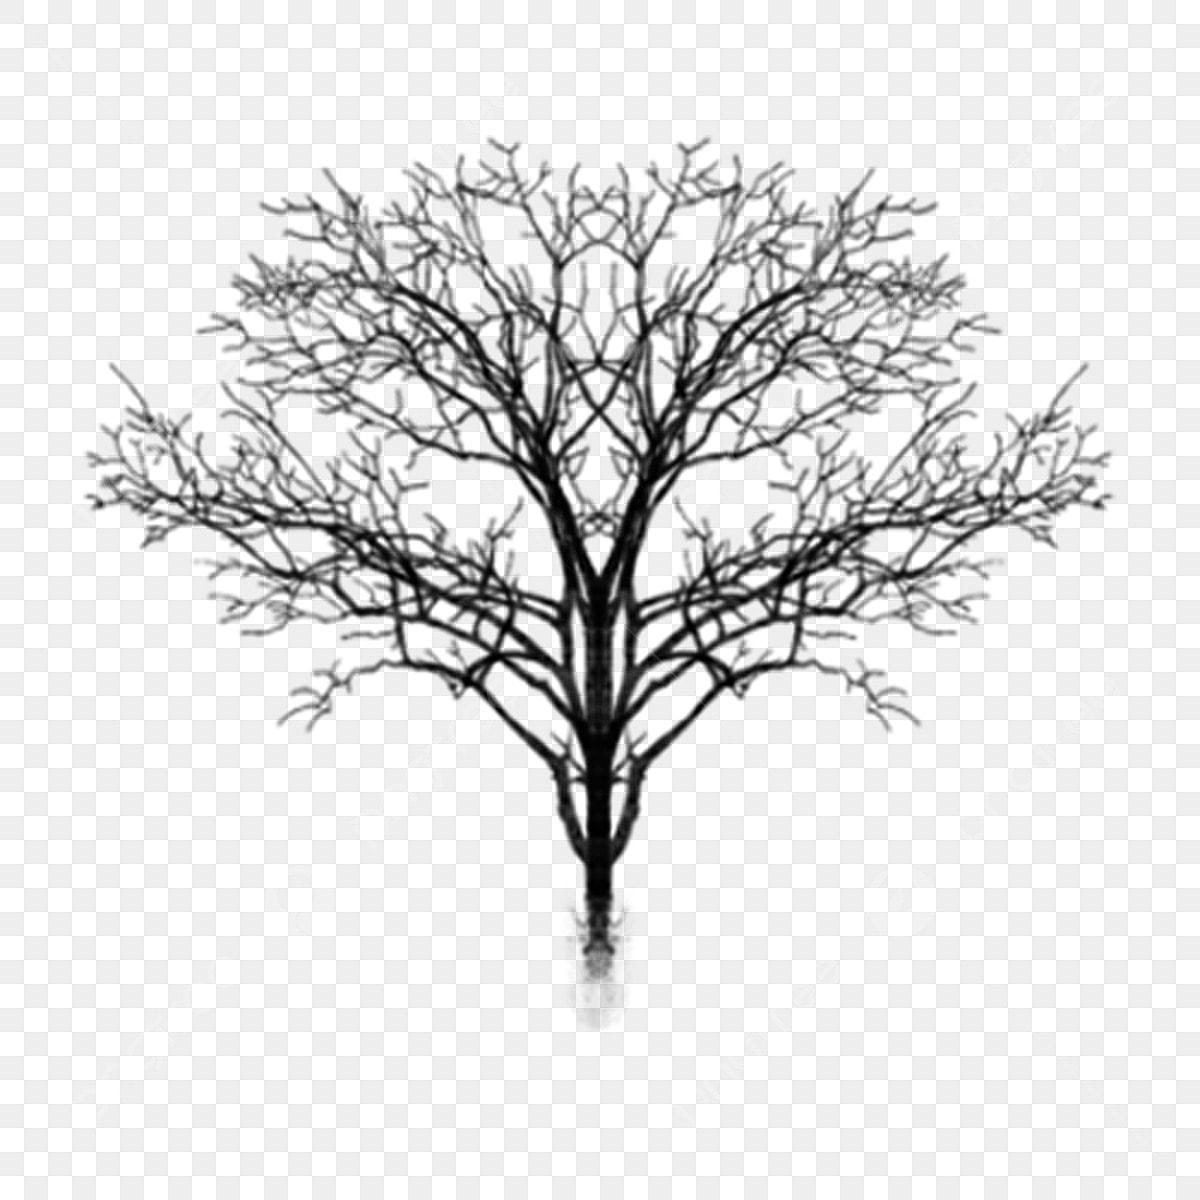 Bahan Komersial Siluet Pokok